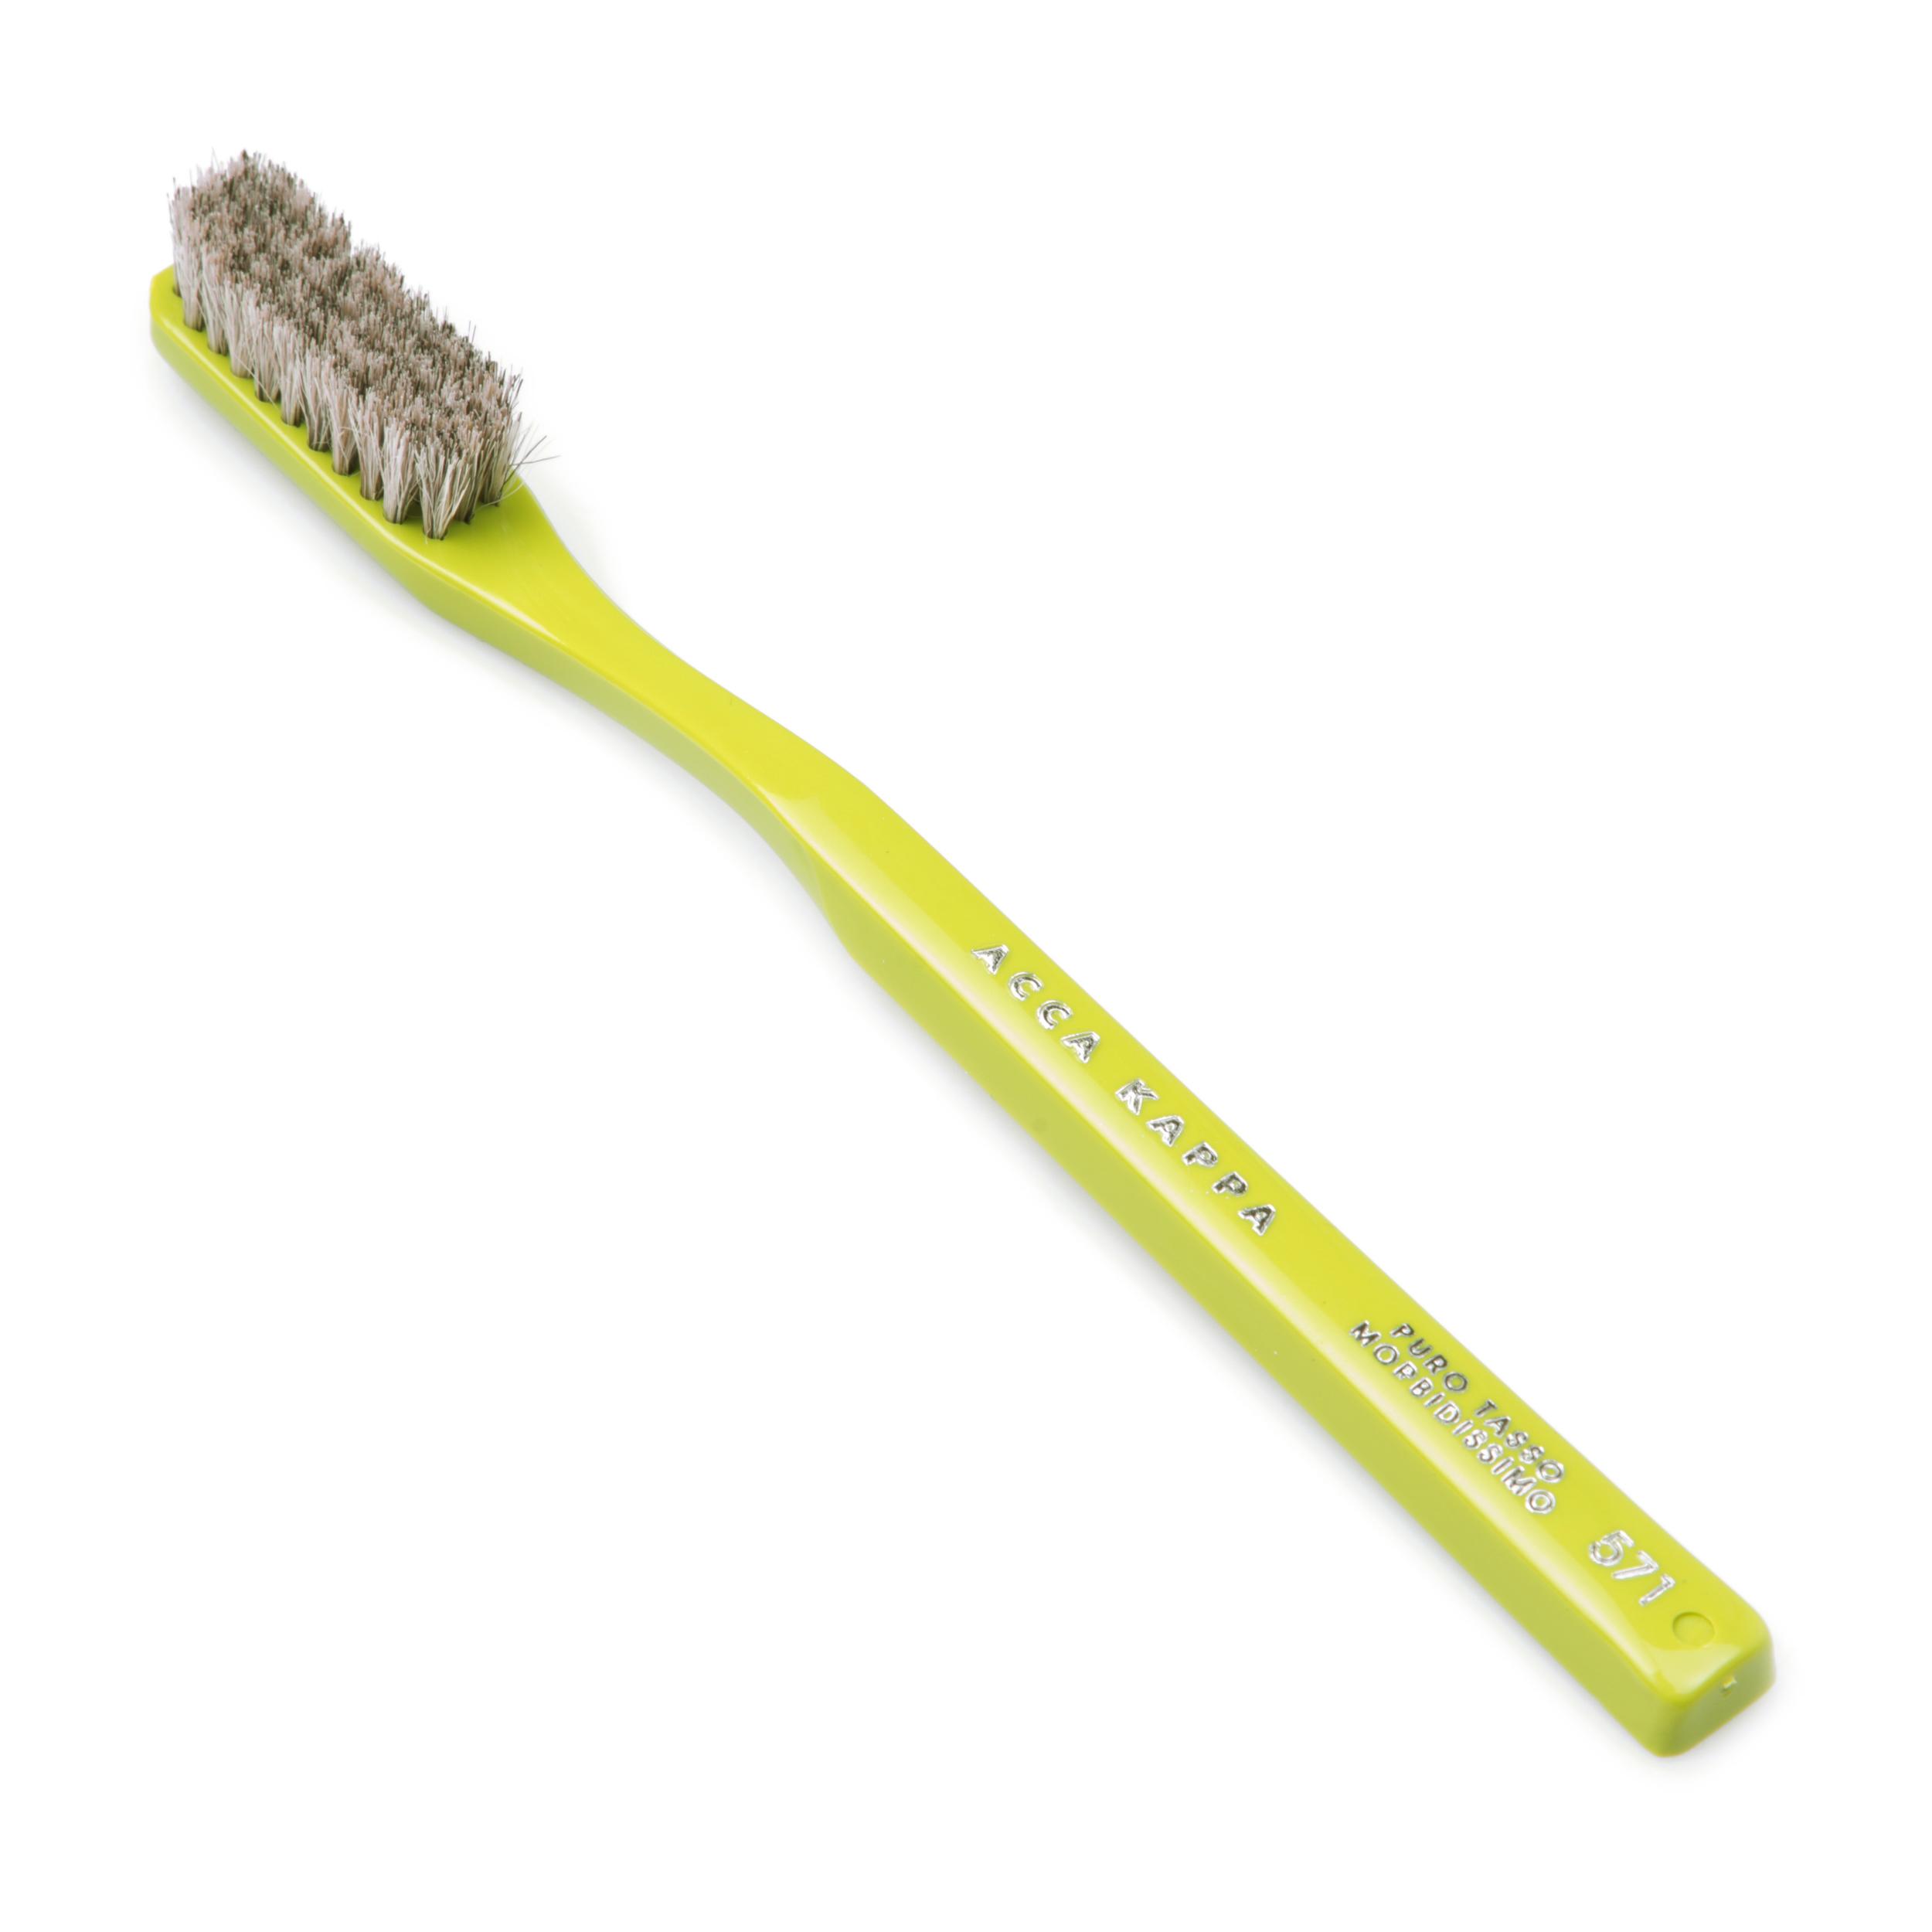 Зубная щетка очень мягкая 571